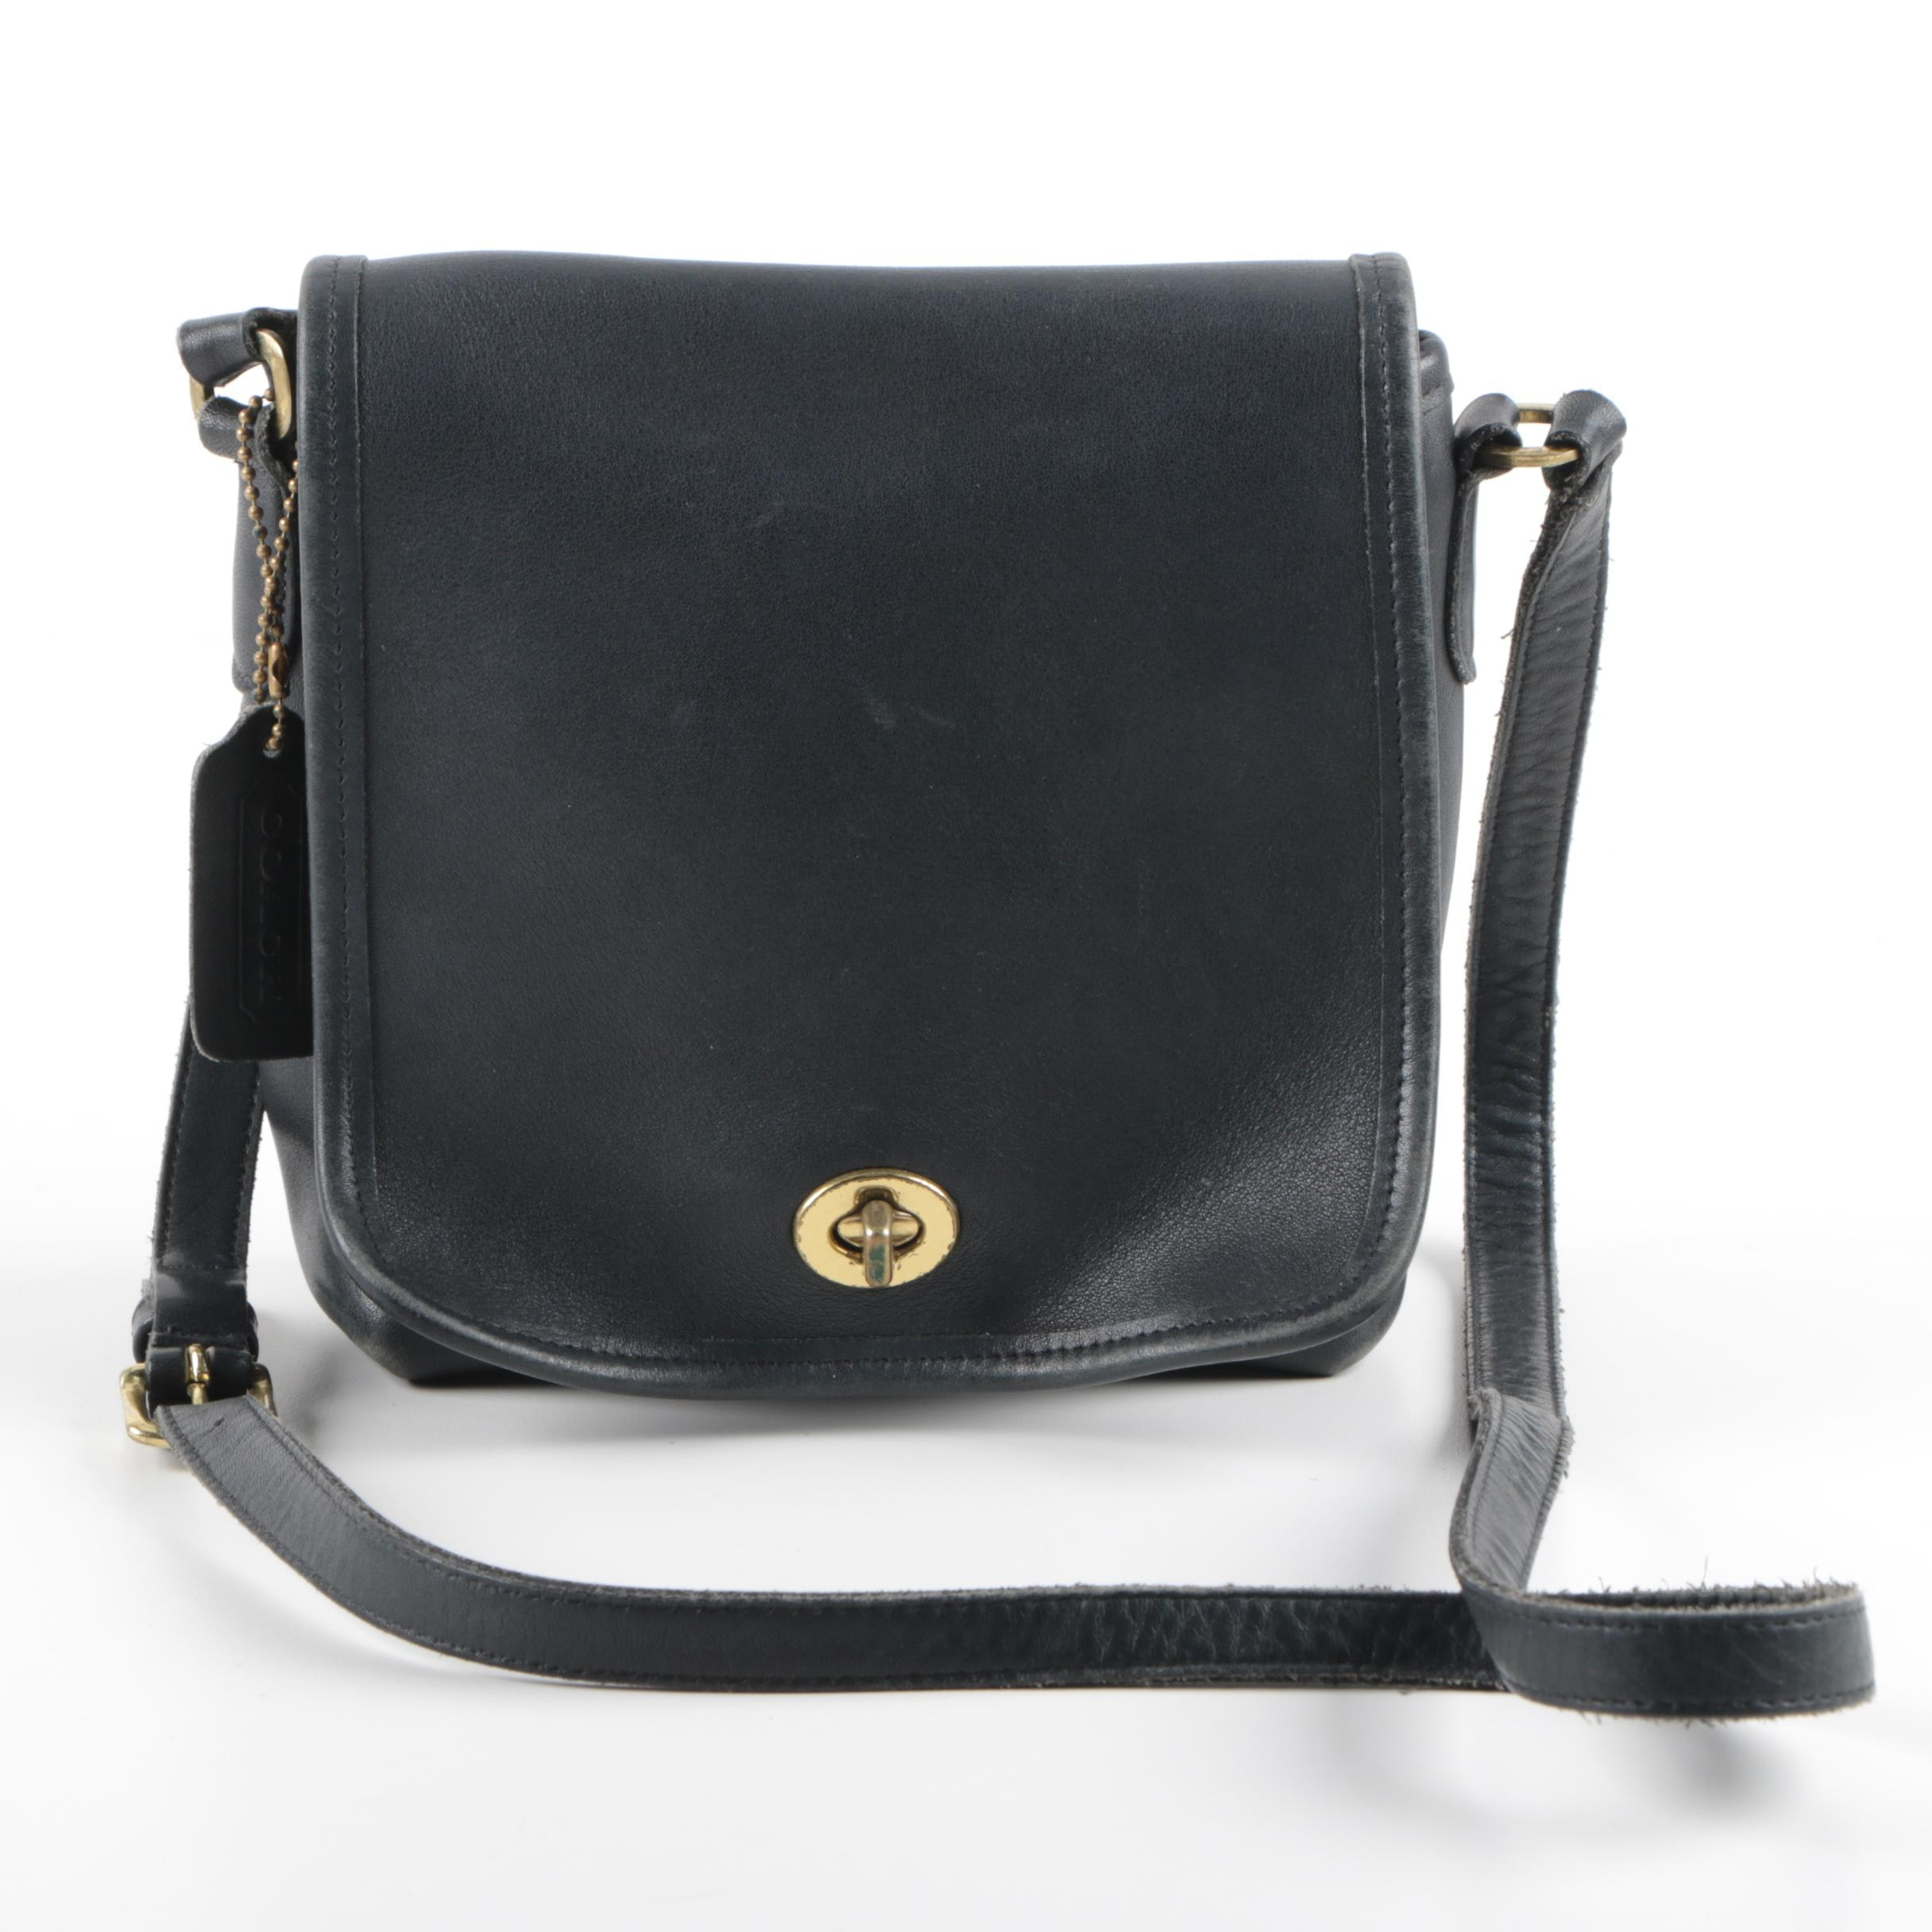 Coach Companion Black Leather Flap Bag